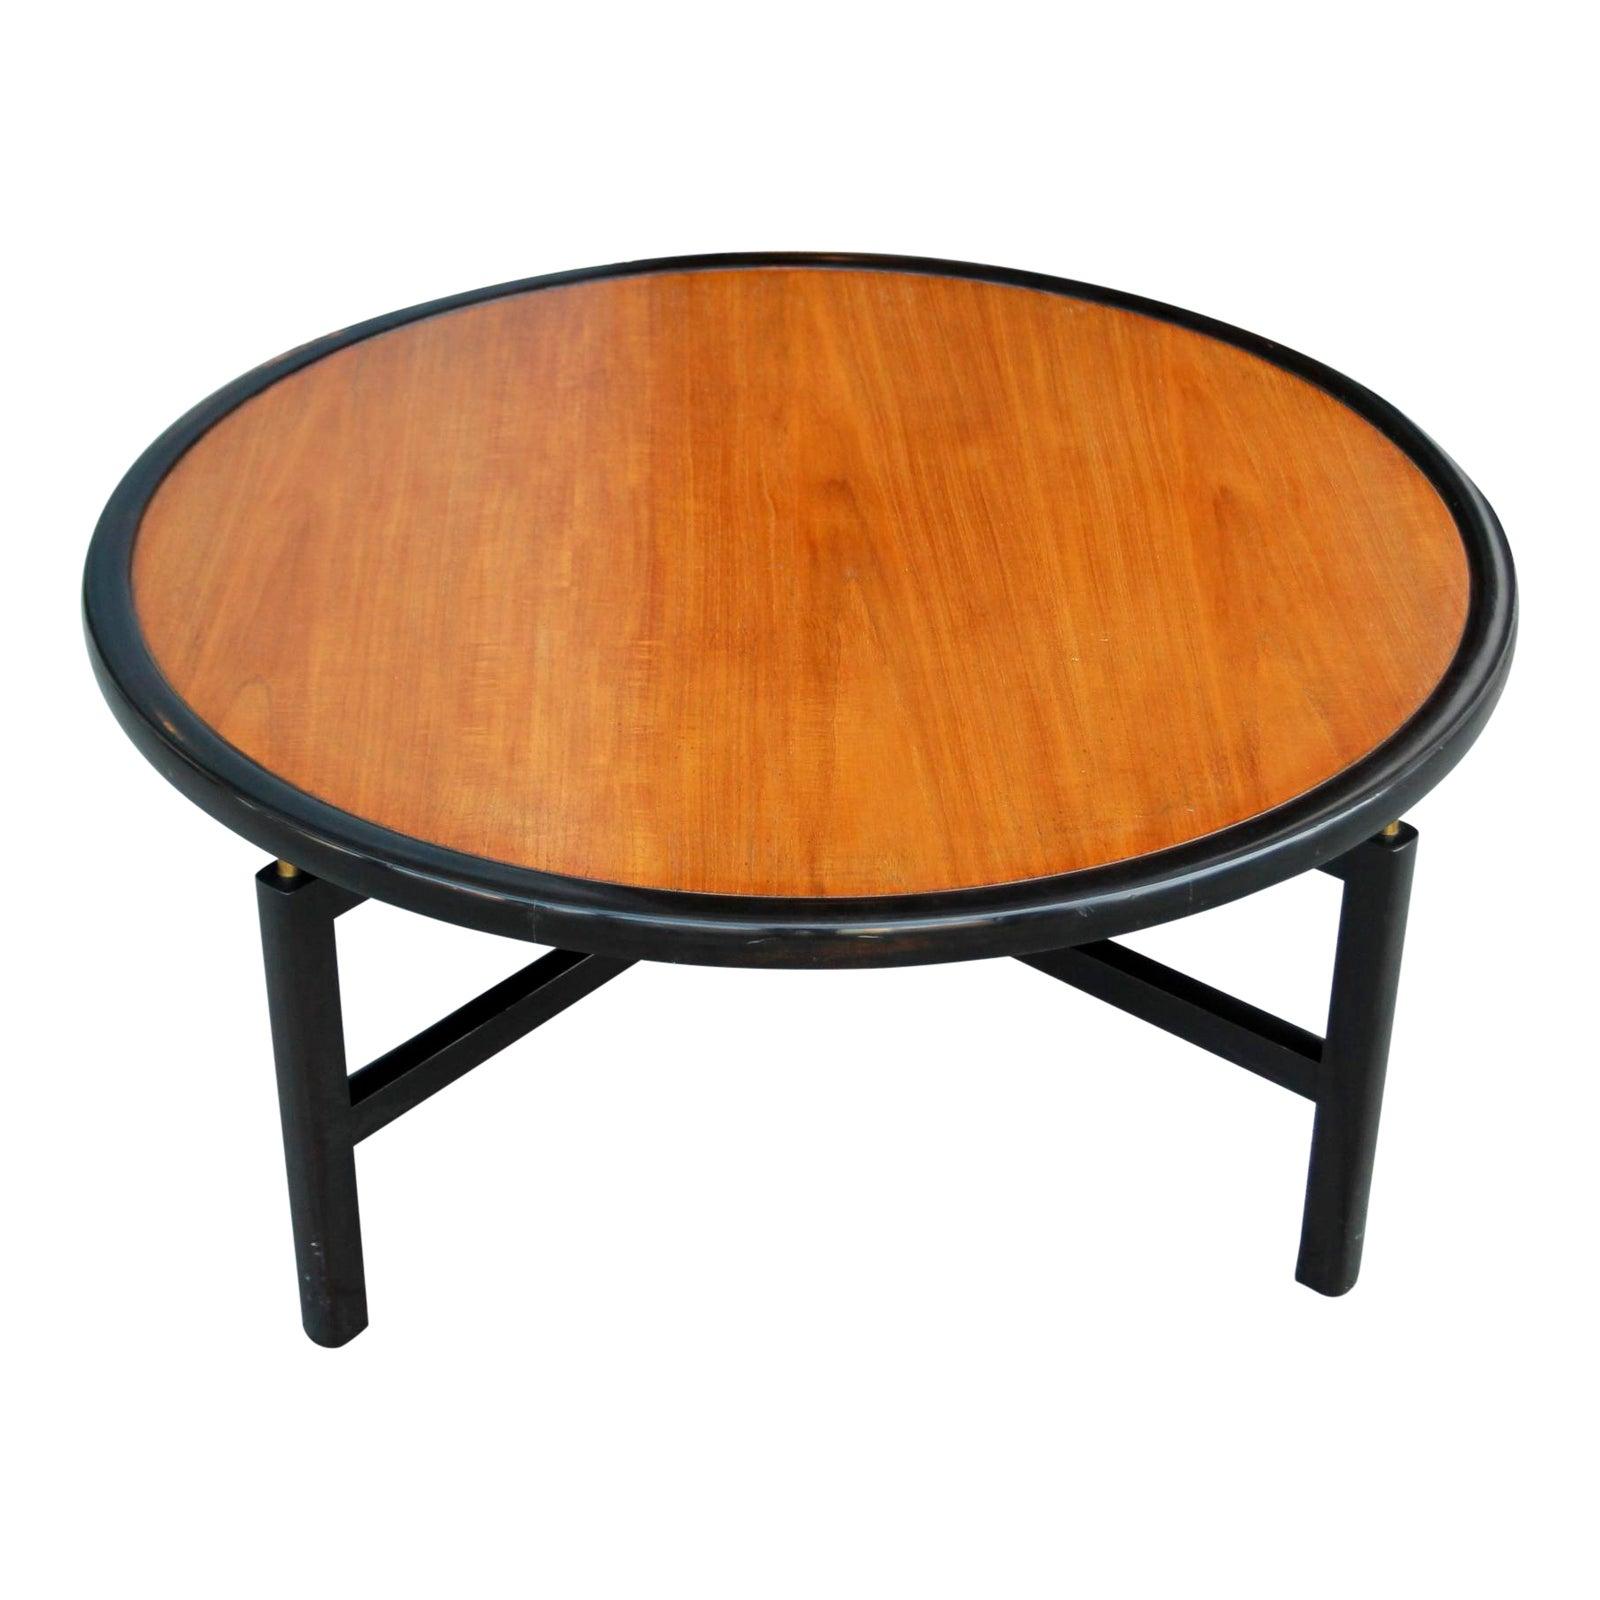 1960s Mid Century Modern Baker Furnitue Round Coffee Table Chairish